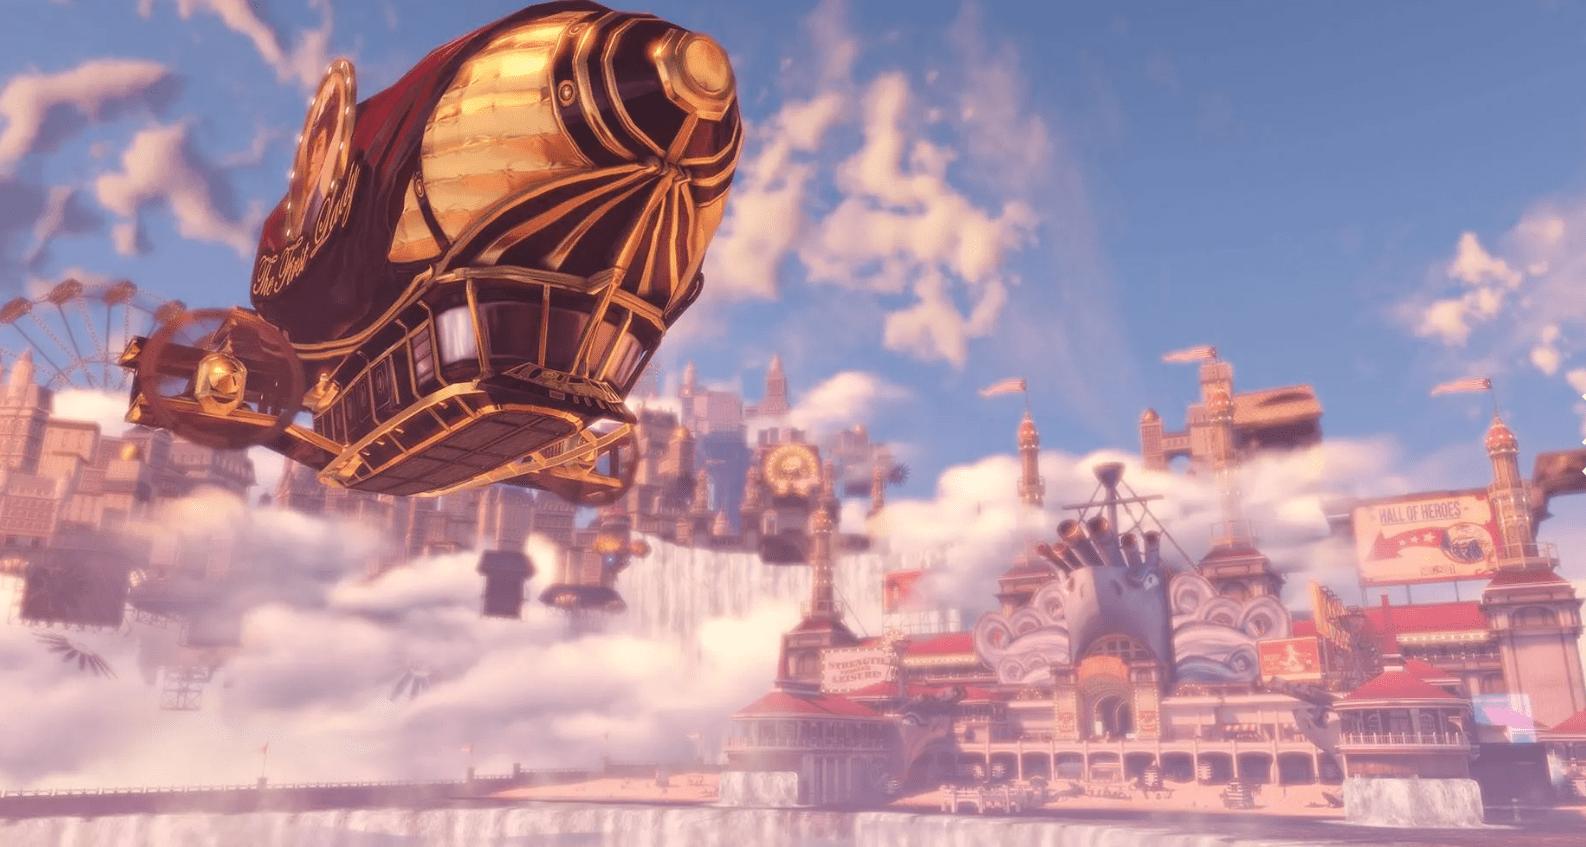 Is 2K's Mysterious Novato Studio Secretly Working On Another BioShock Sequel?